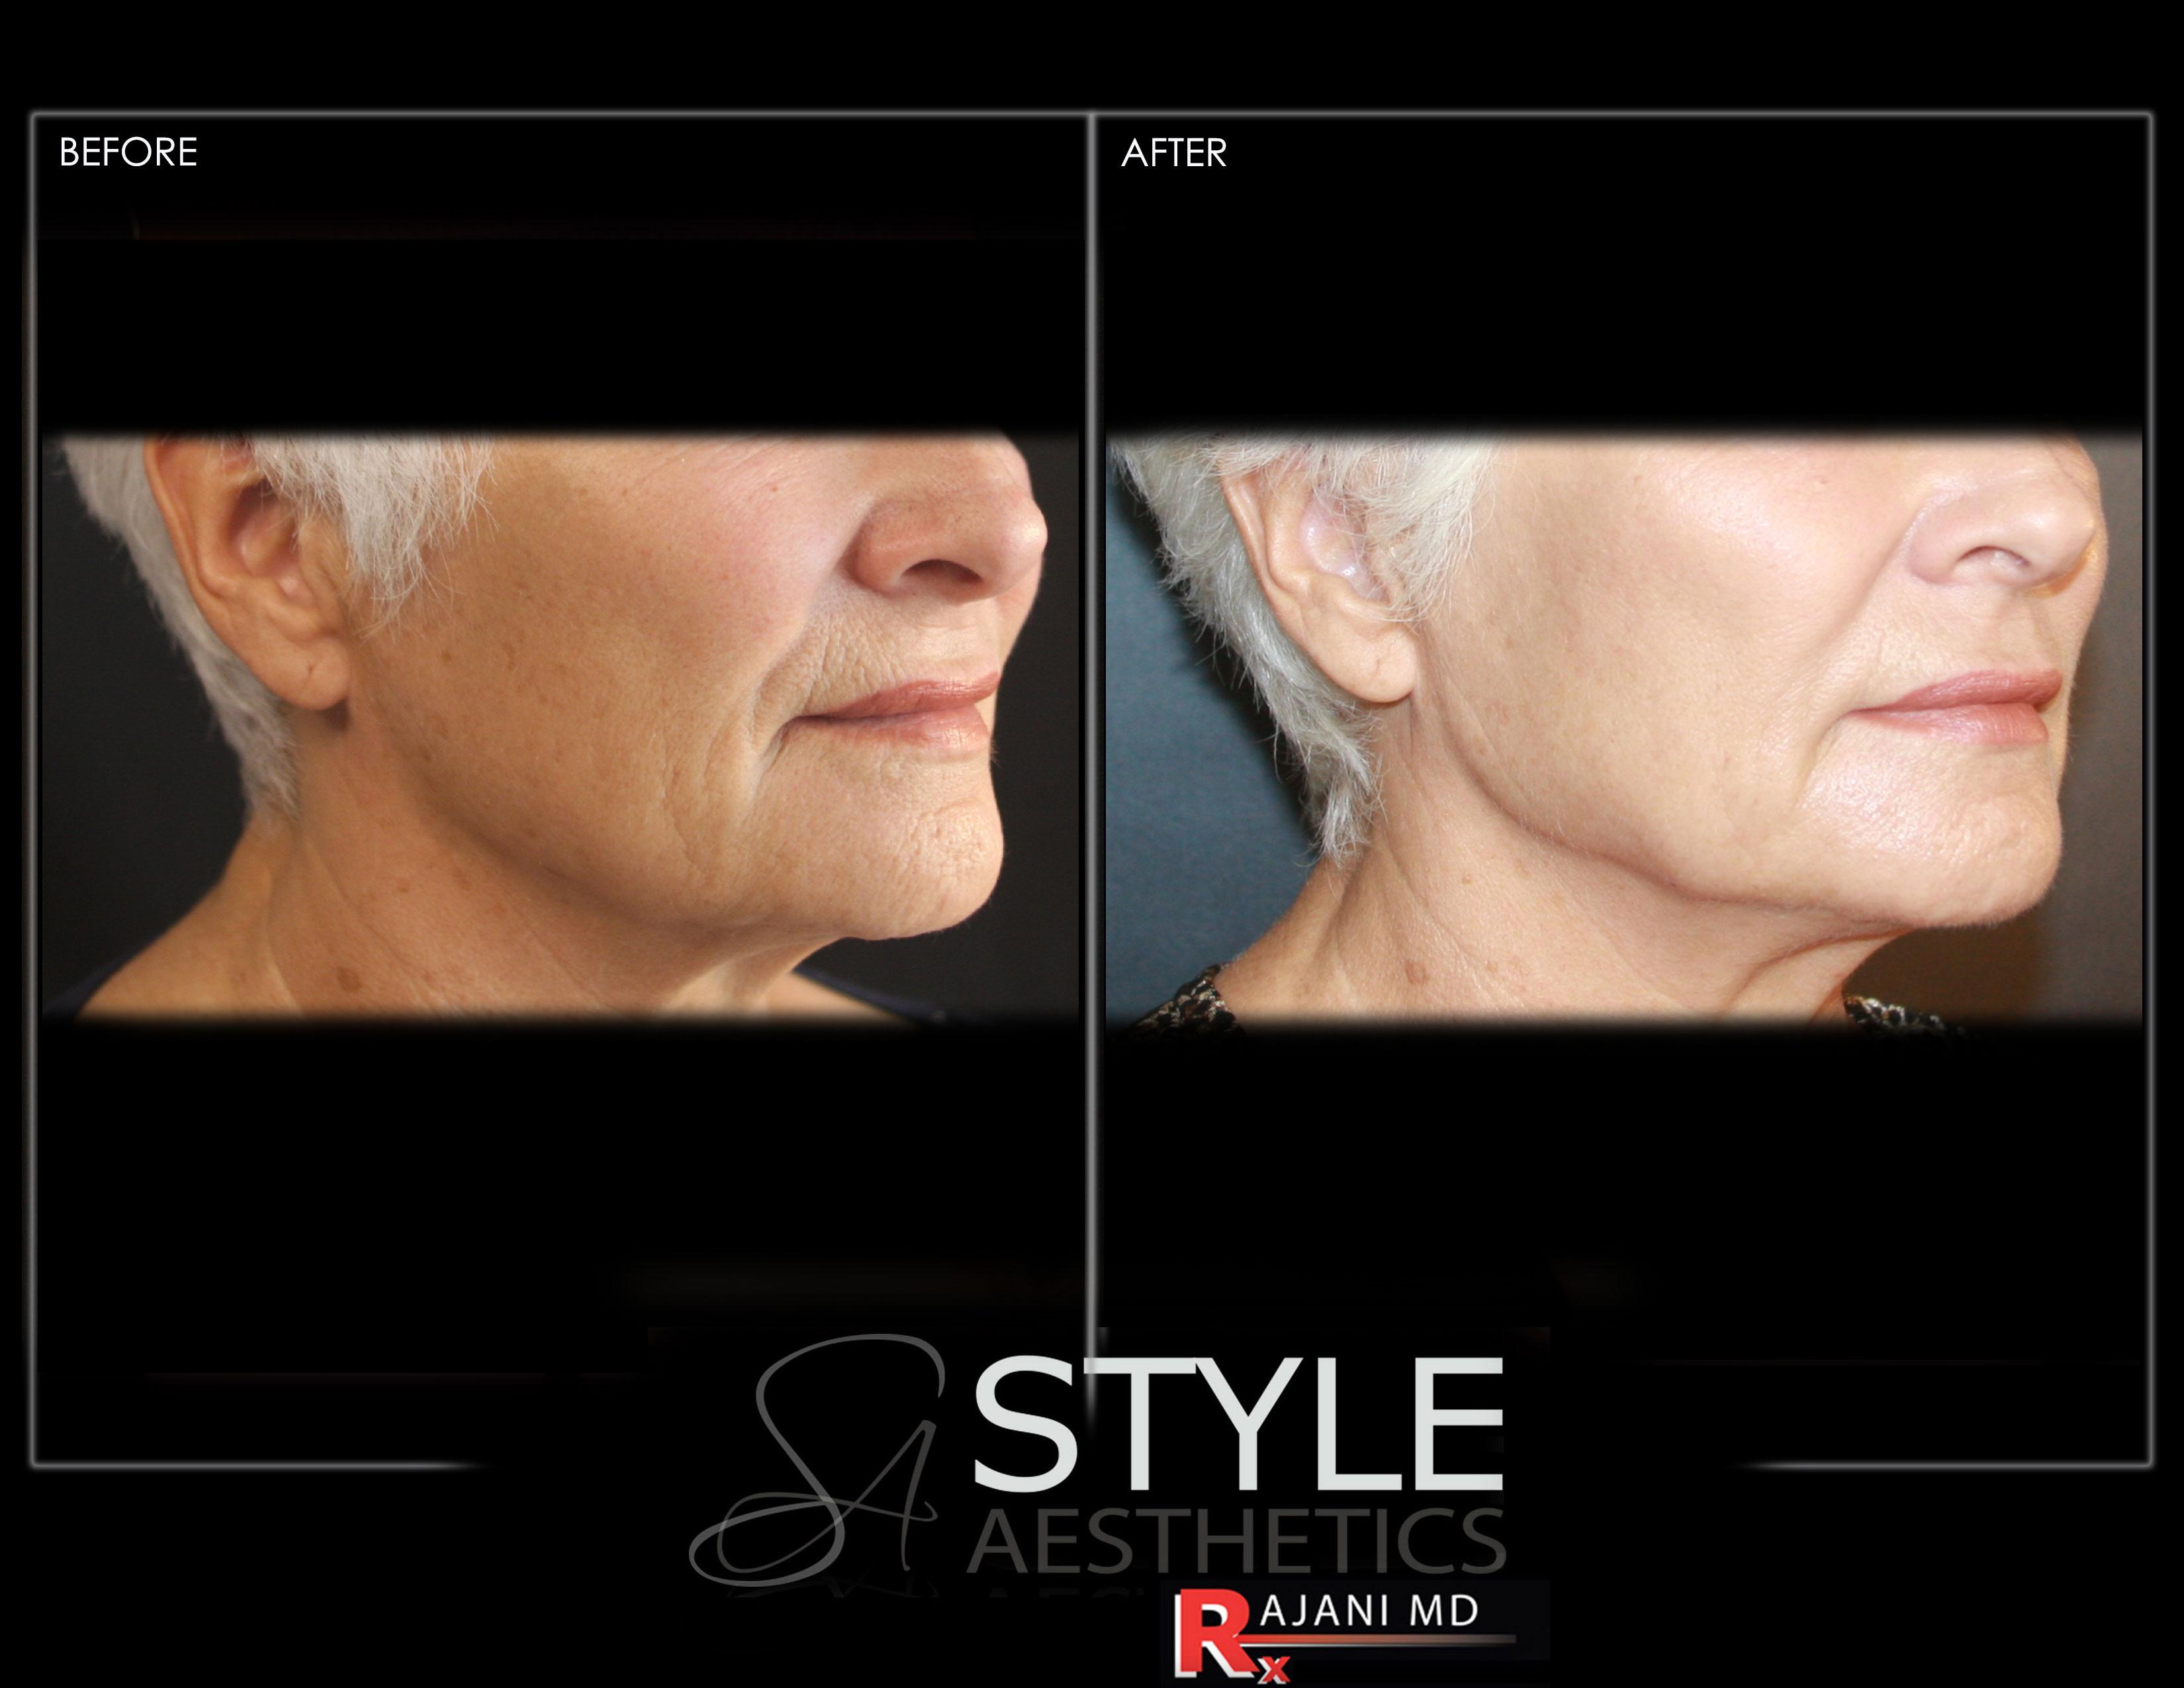 VFR Skin Treatments by RajaniMD